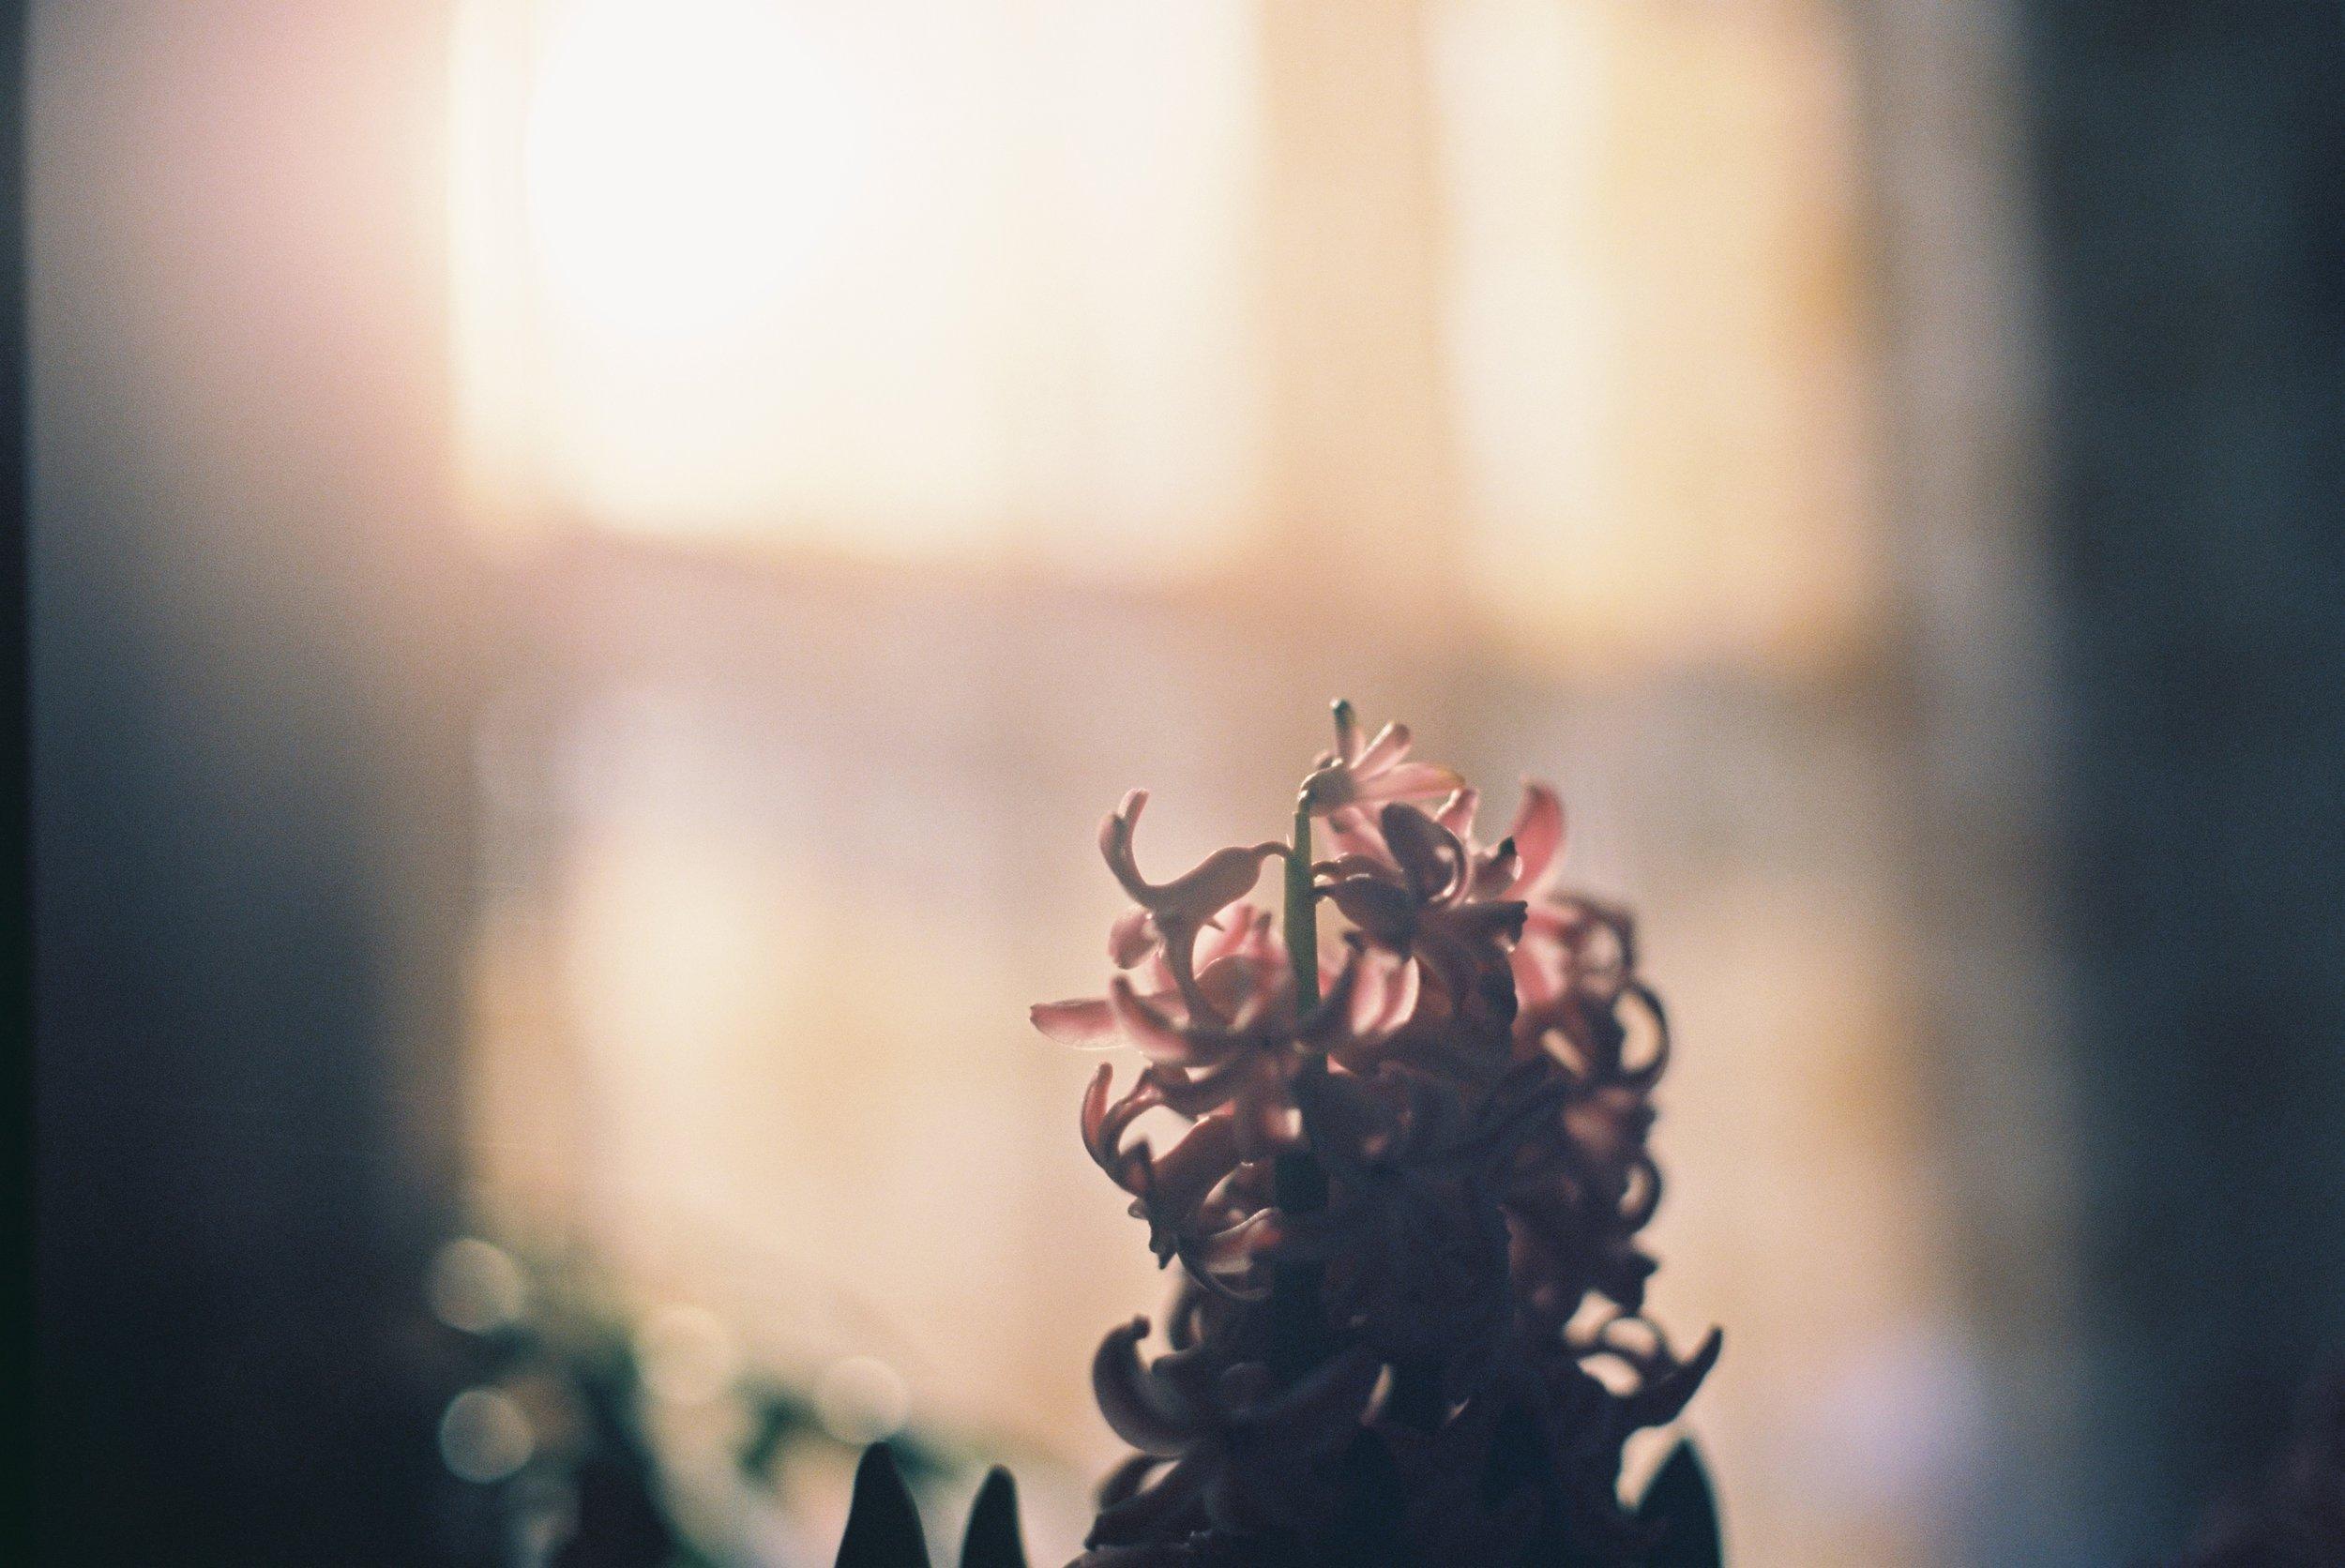 Hyacinth - Canon AE-1p on Ektar 100